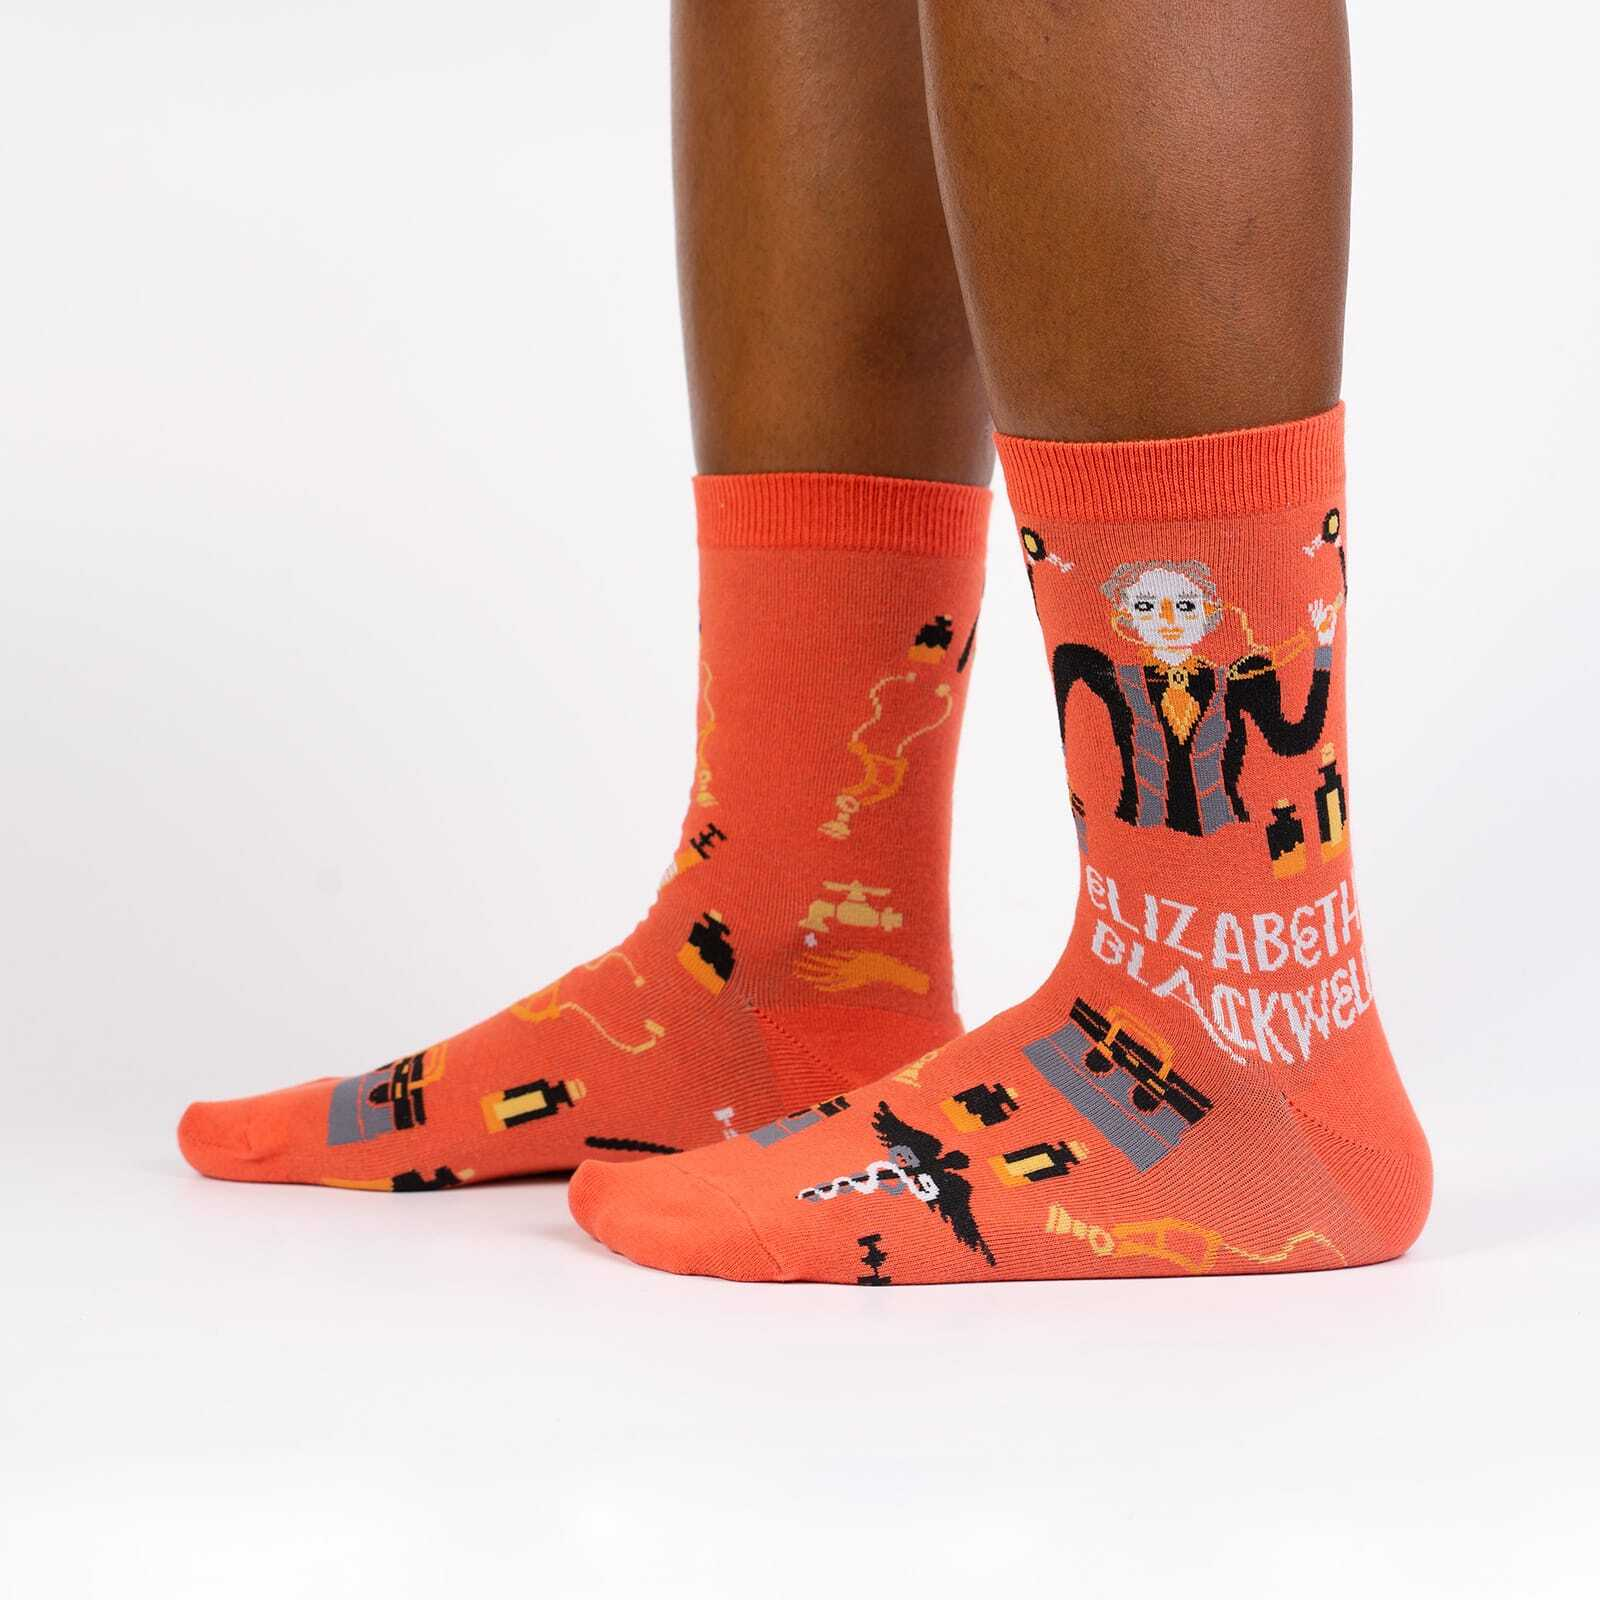 Elizabeth Blackwell - Famous Science Feminist Icons Crew Socks Orange - Women's in Orange